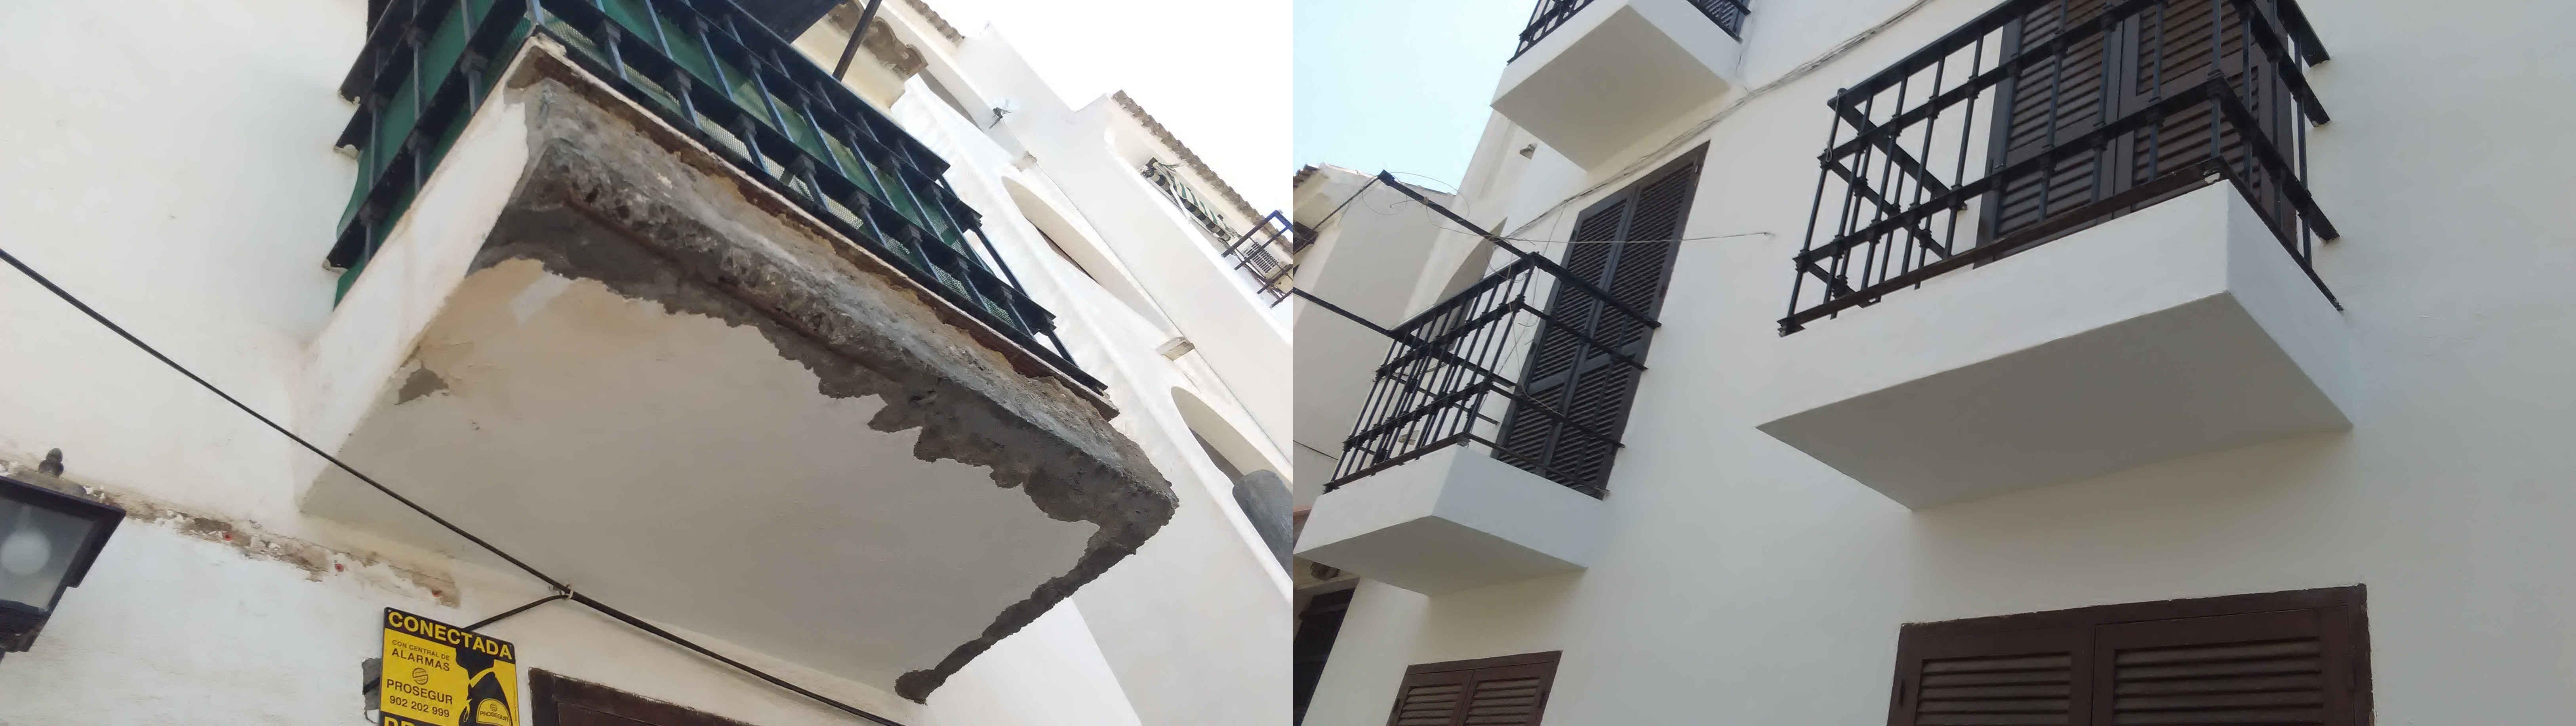 reformas fachadas torrevieja orihuela